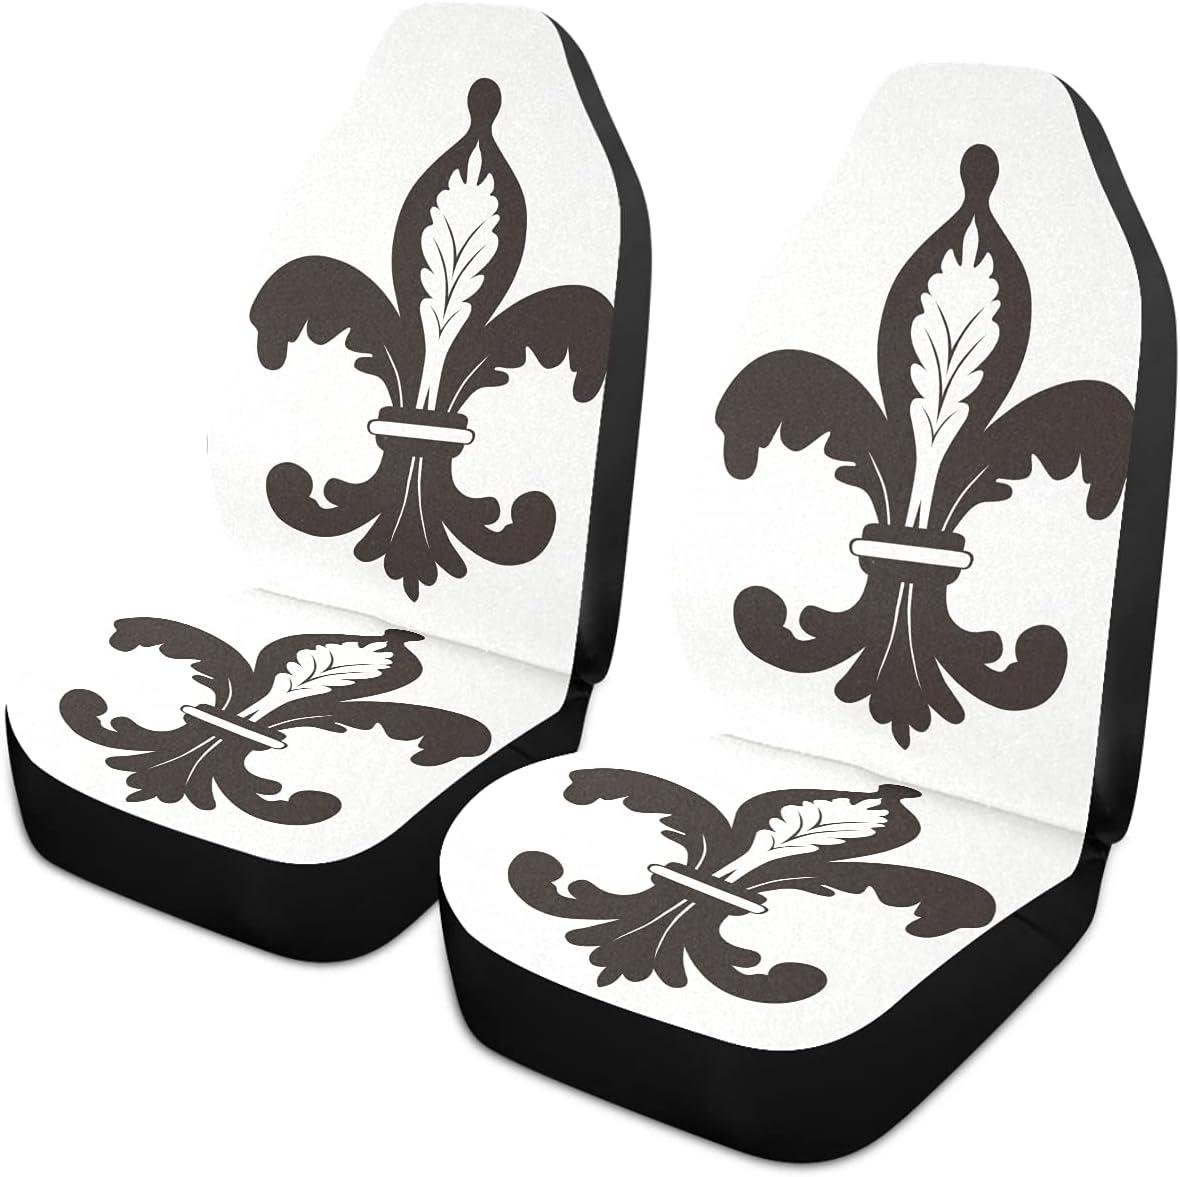 Oarencol Black White Fleur De Lis Uni Mardi Seat Gras National products Covers Car Nashville-Davidson Mall